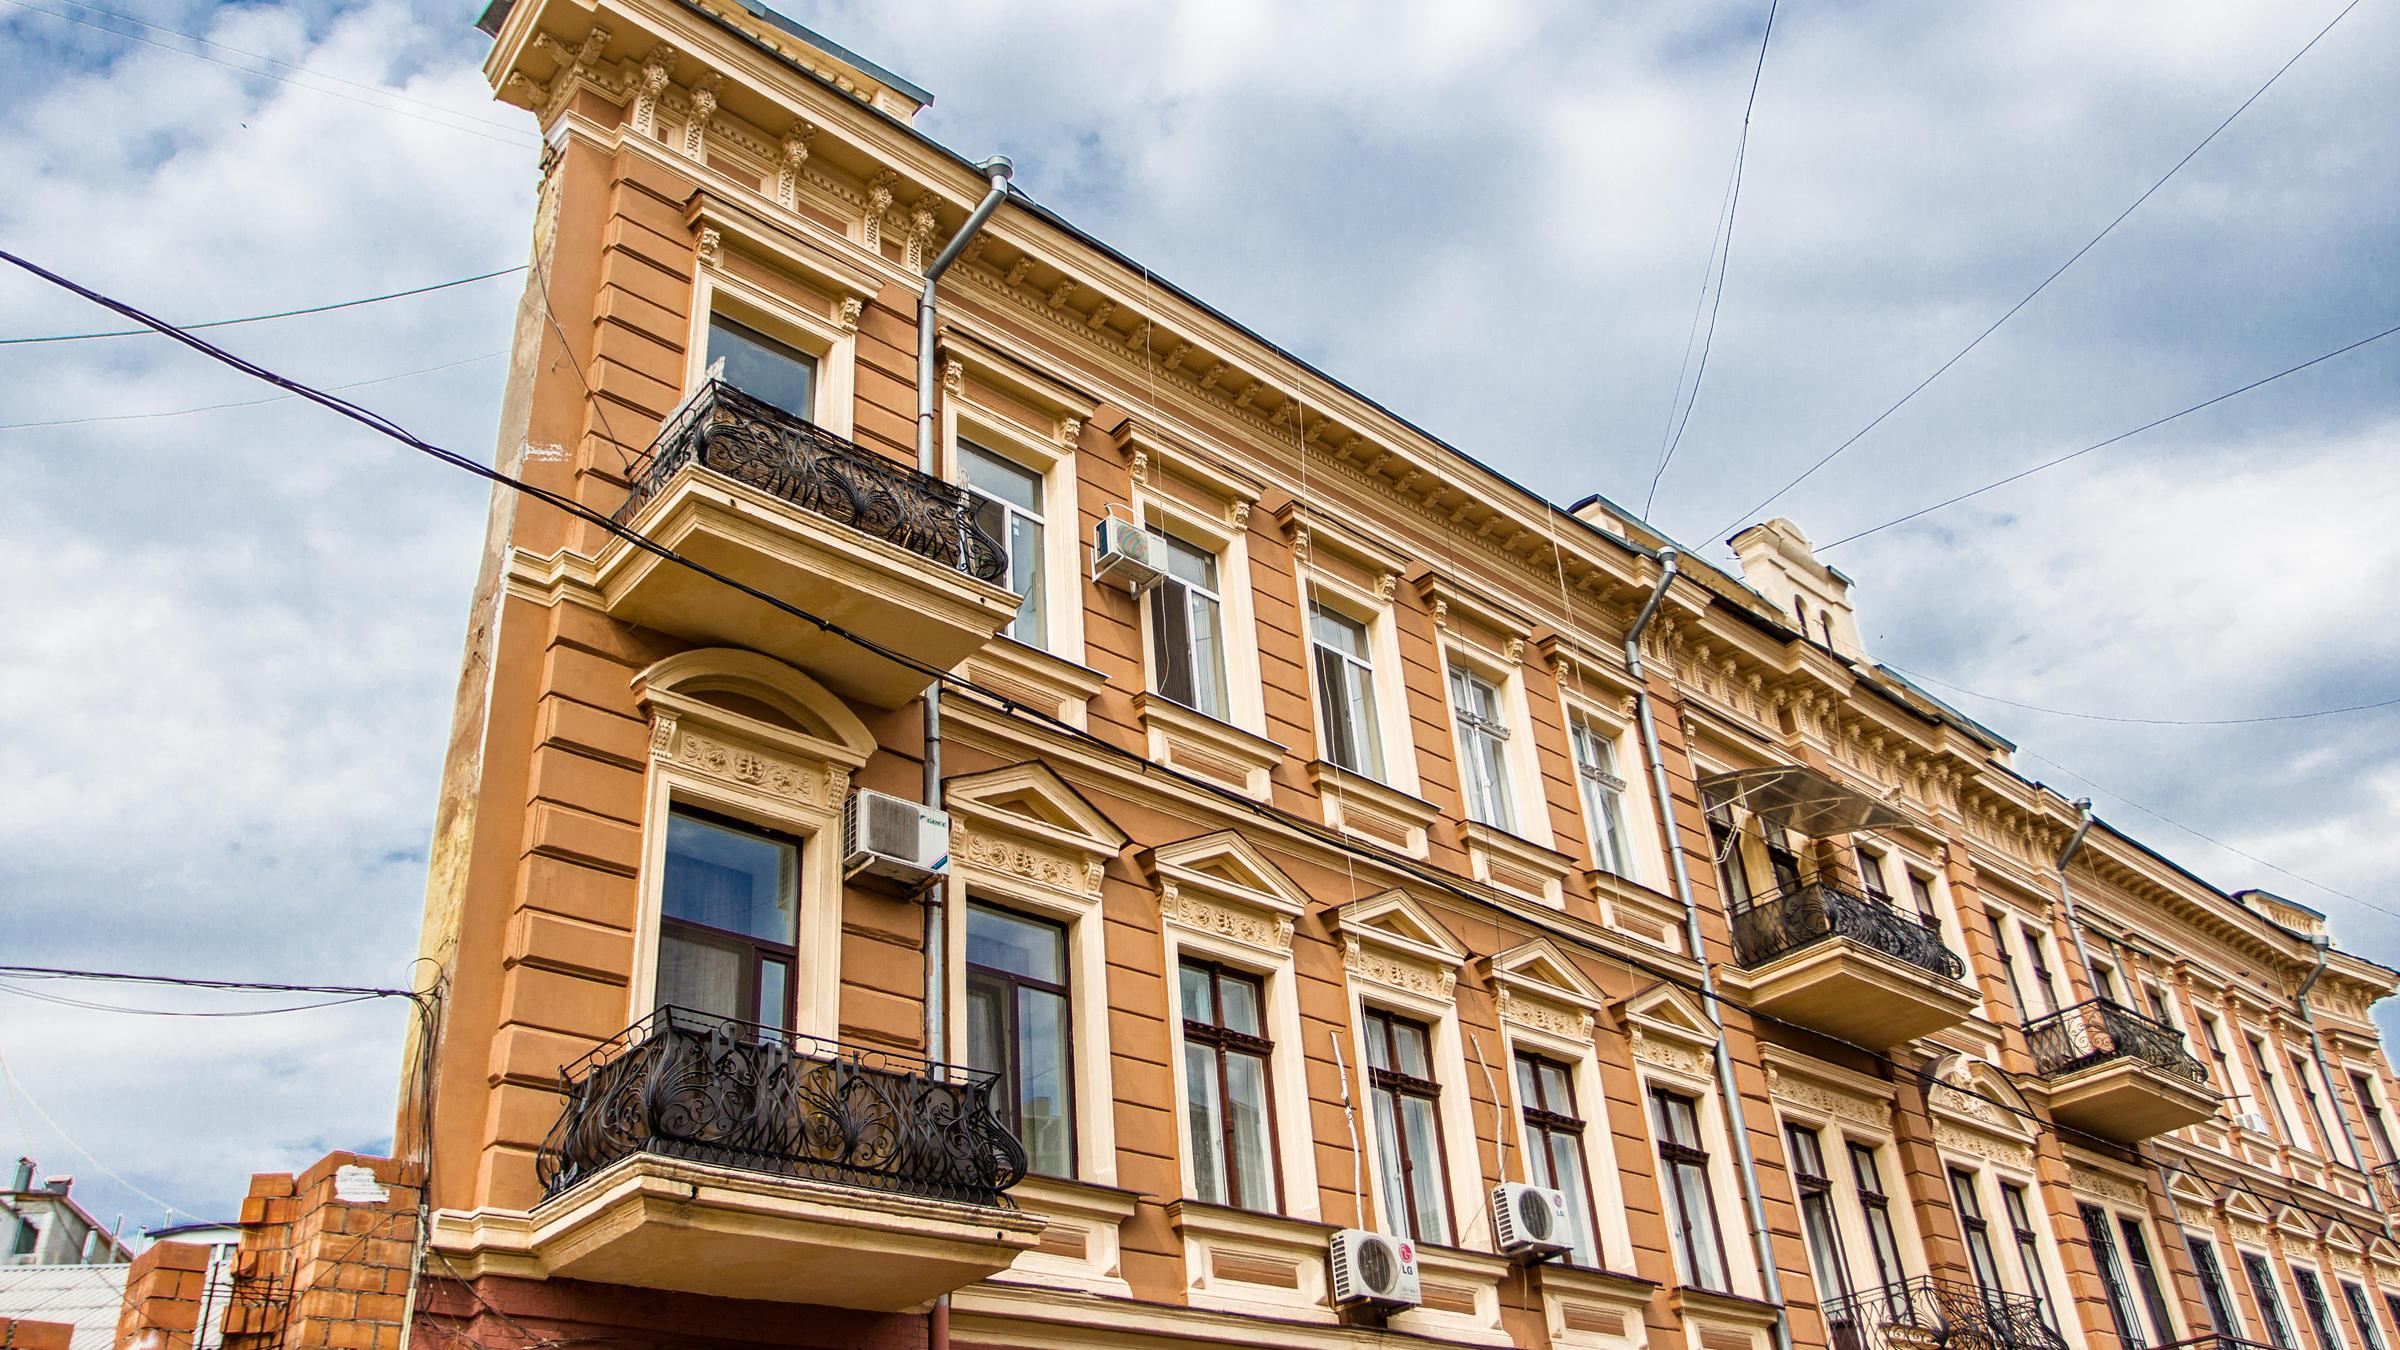 Flat House in Odessa Ukraine